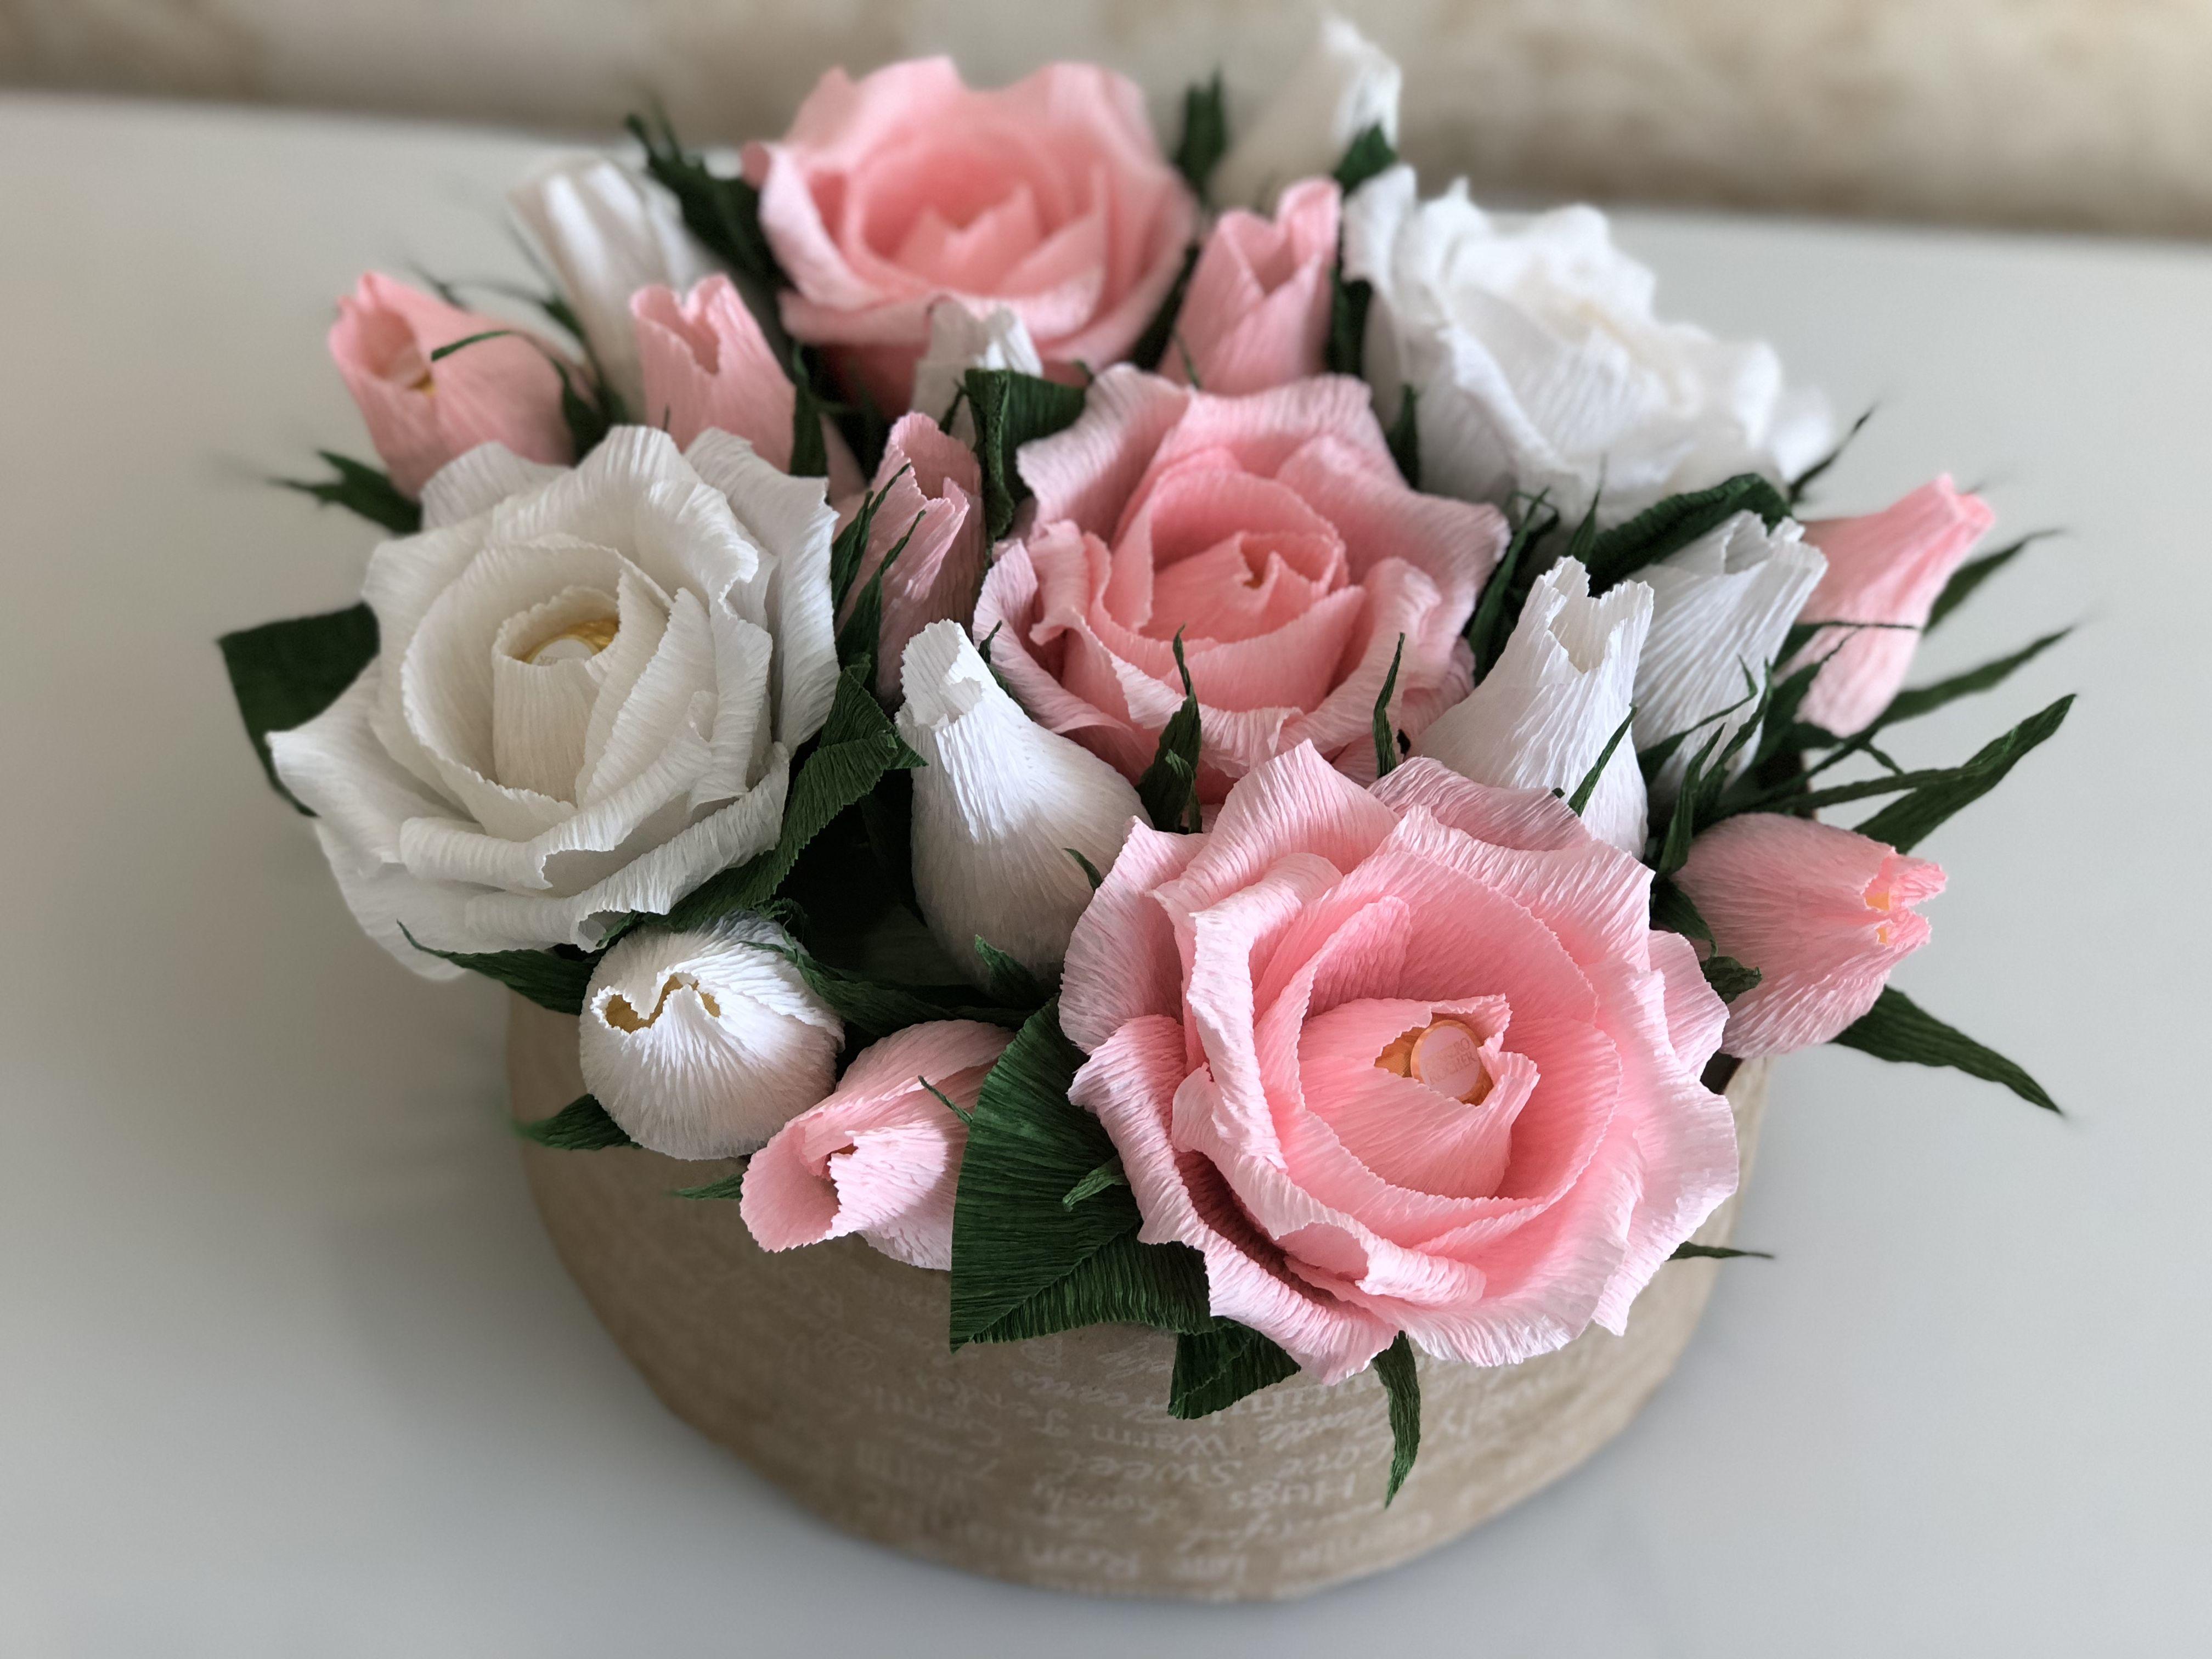 Pin by miglena stoyanova on beauty pinterest candy flowers craft izmirmasajfo